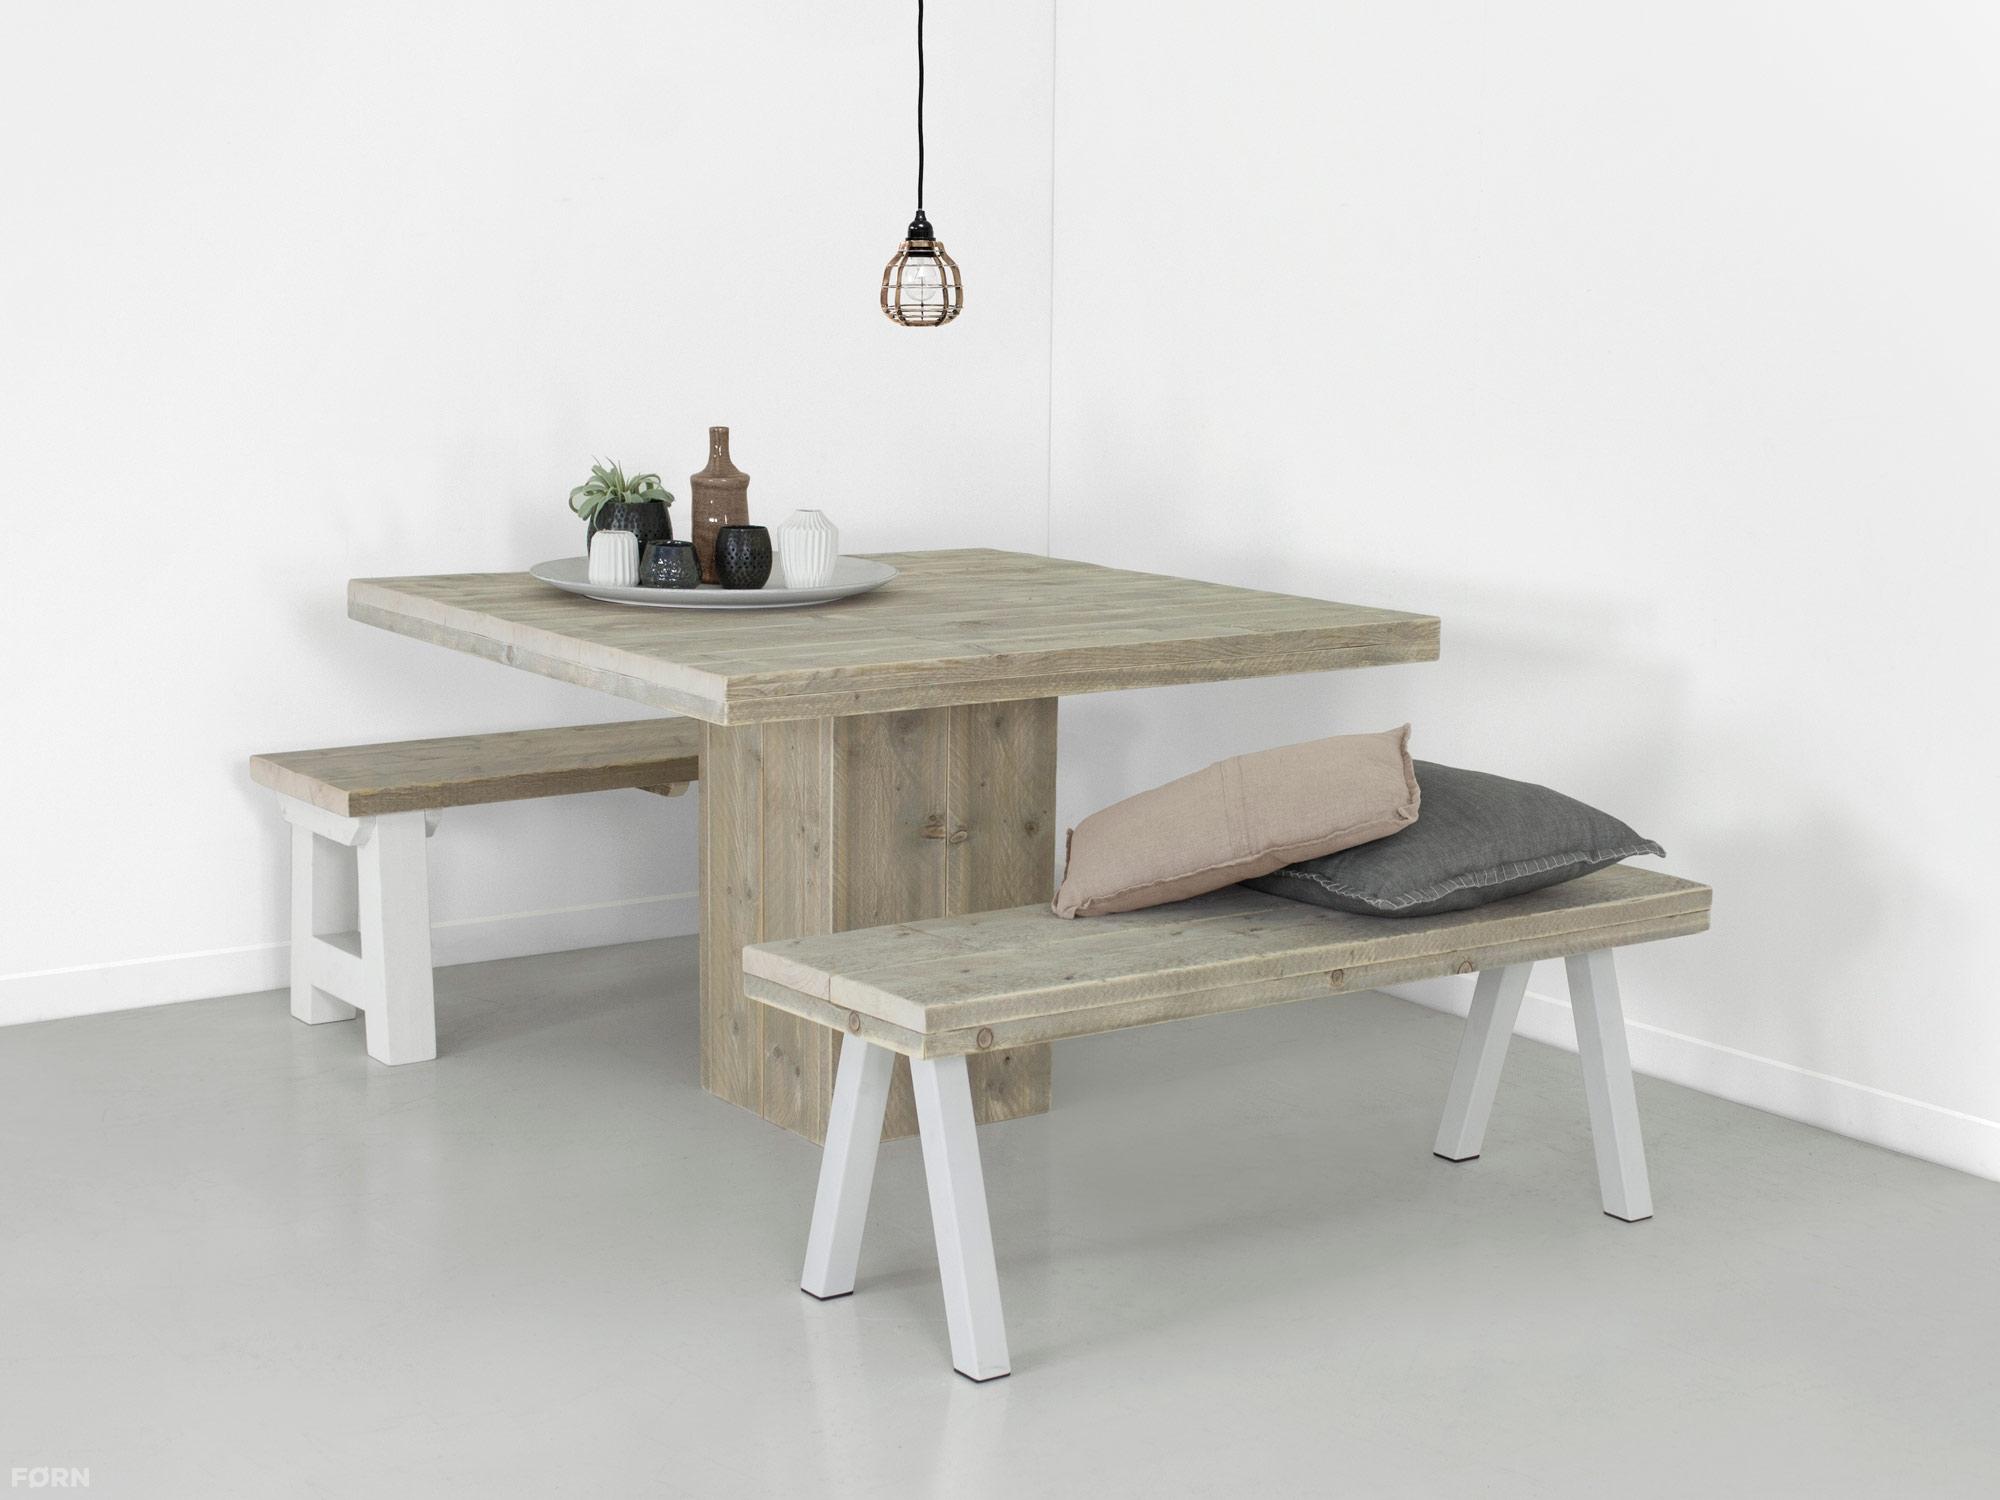 Steigerhouten tafel met kolompoot ook maatwerk f rn for Goedkope industriele eetkamerstoelen